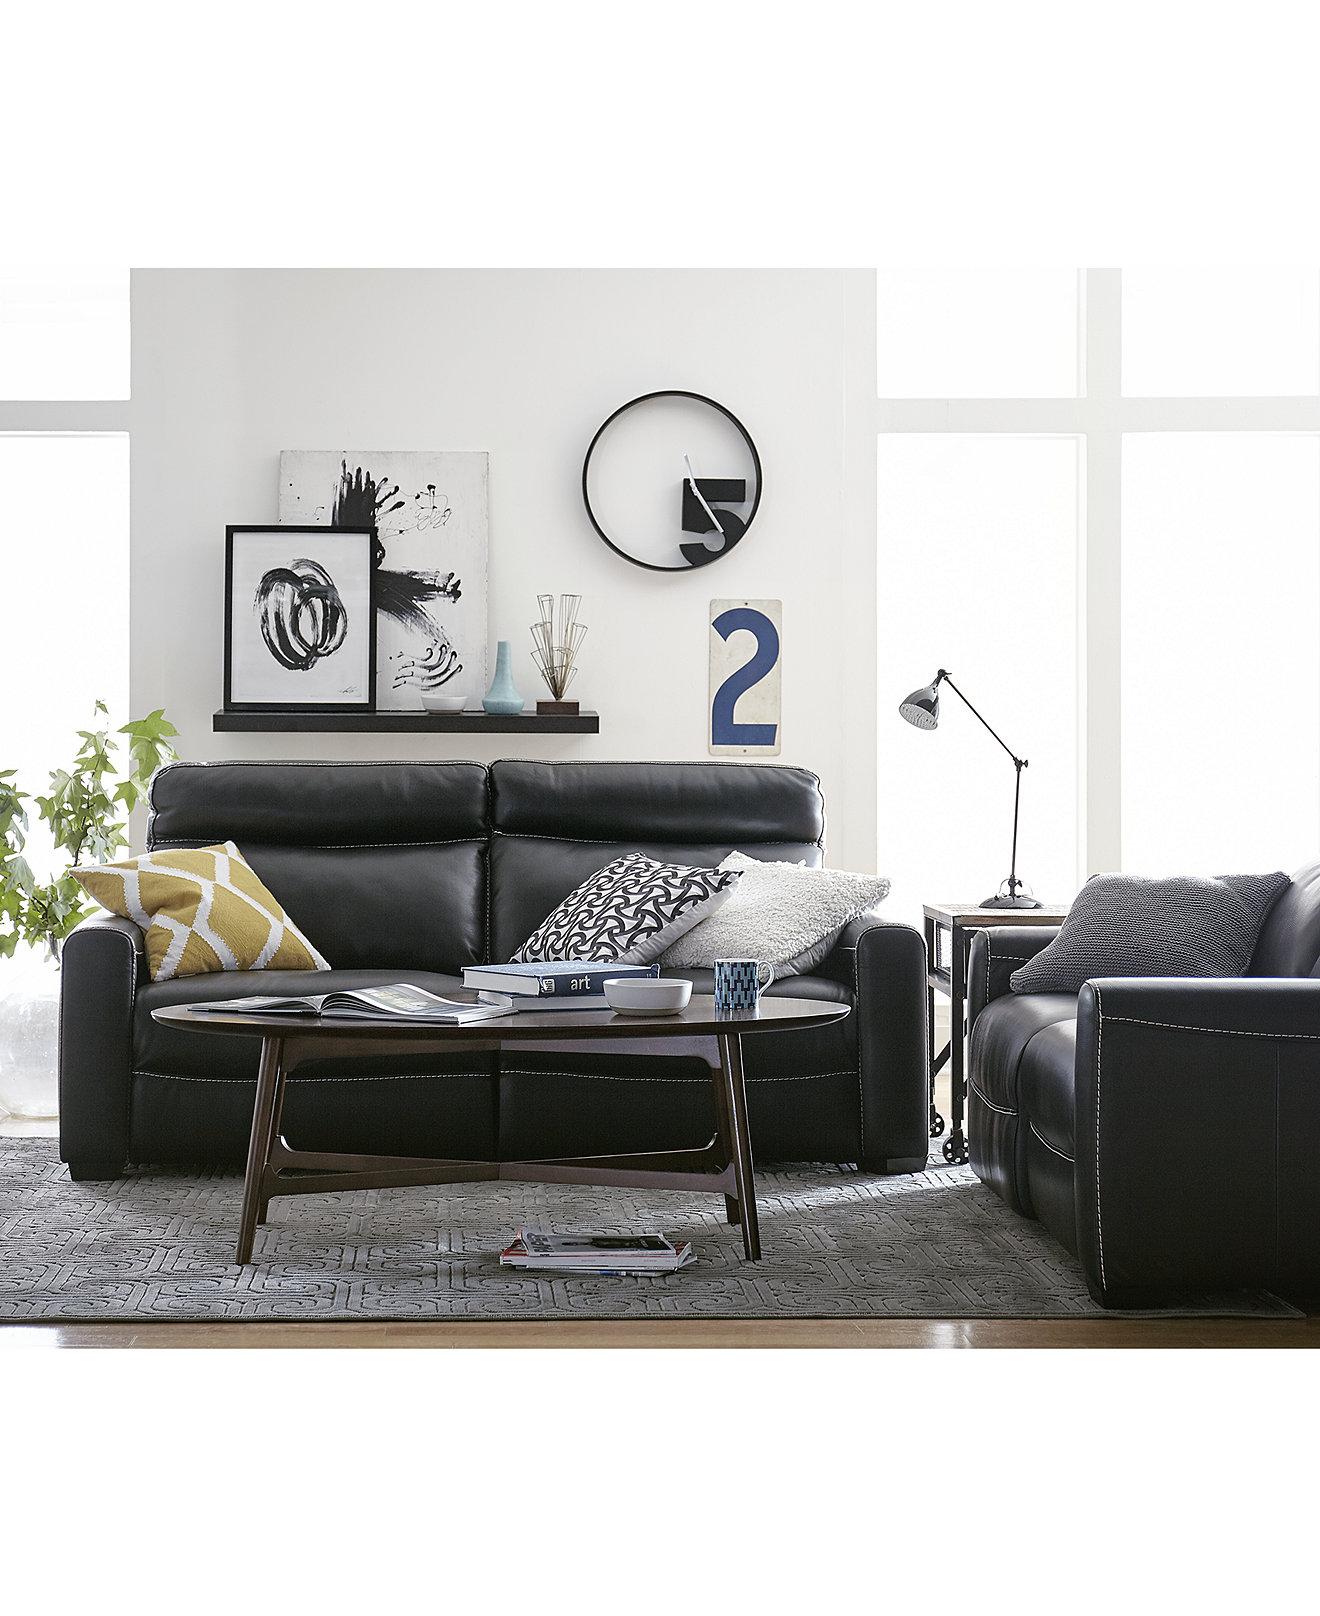 Living Room Furniture On Living Room Furniture Sets Macys